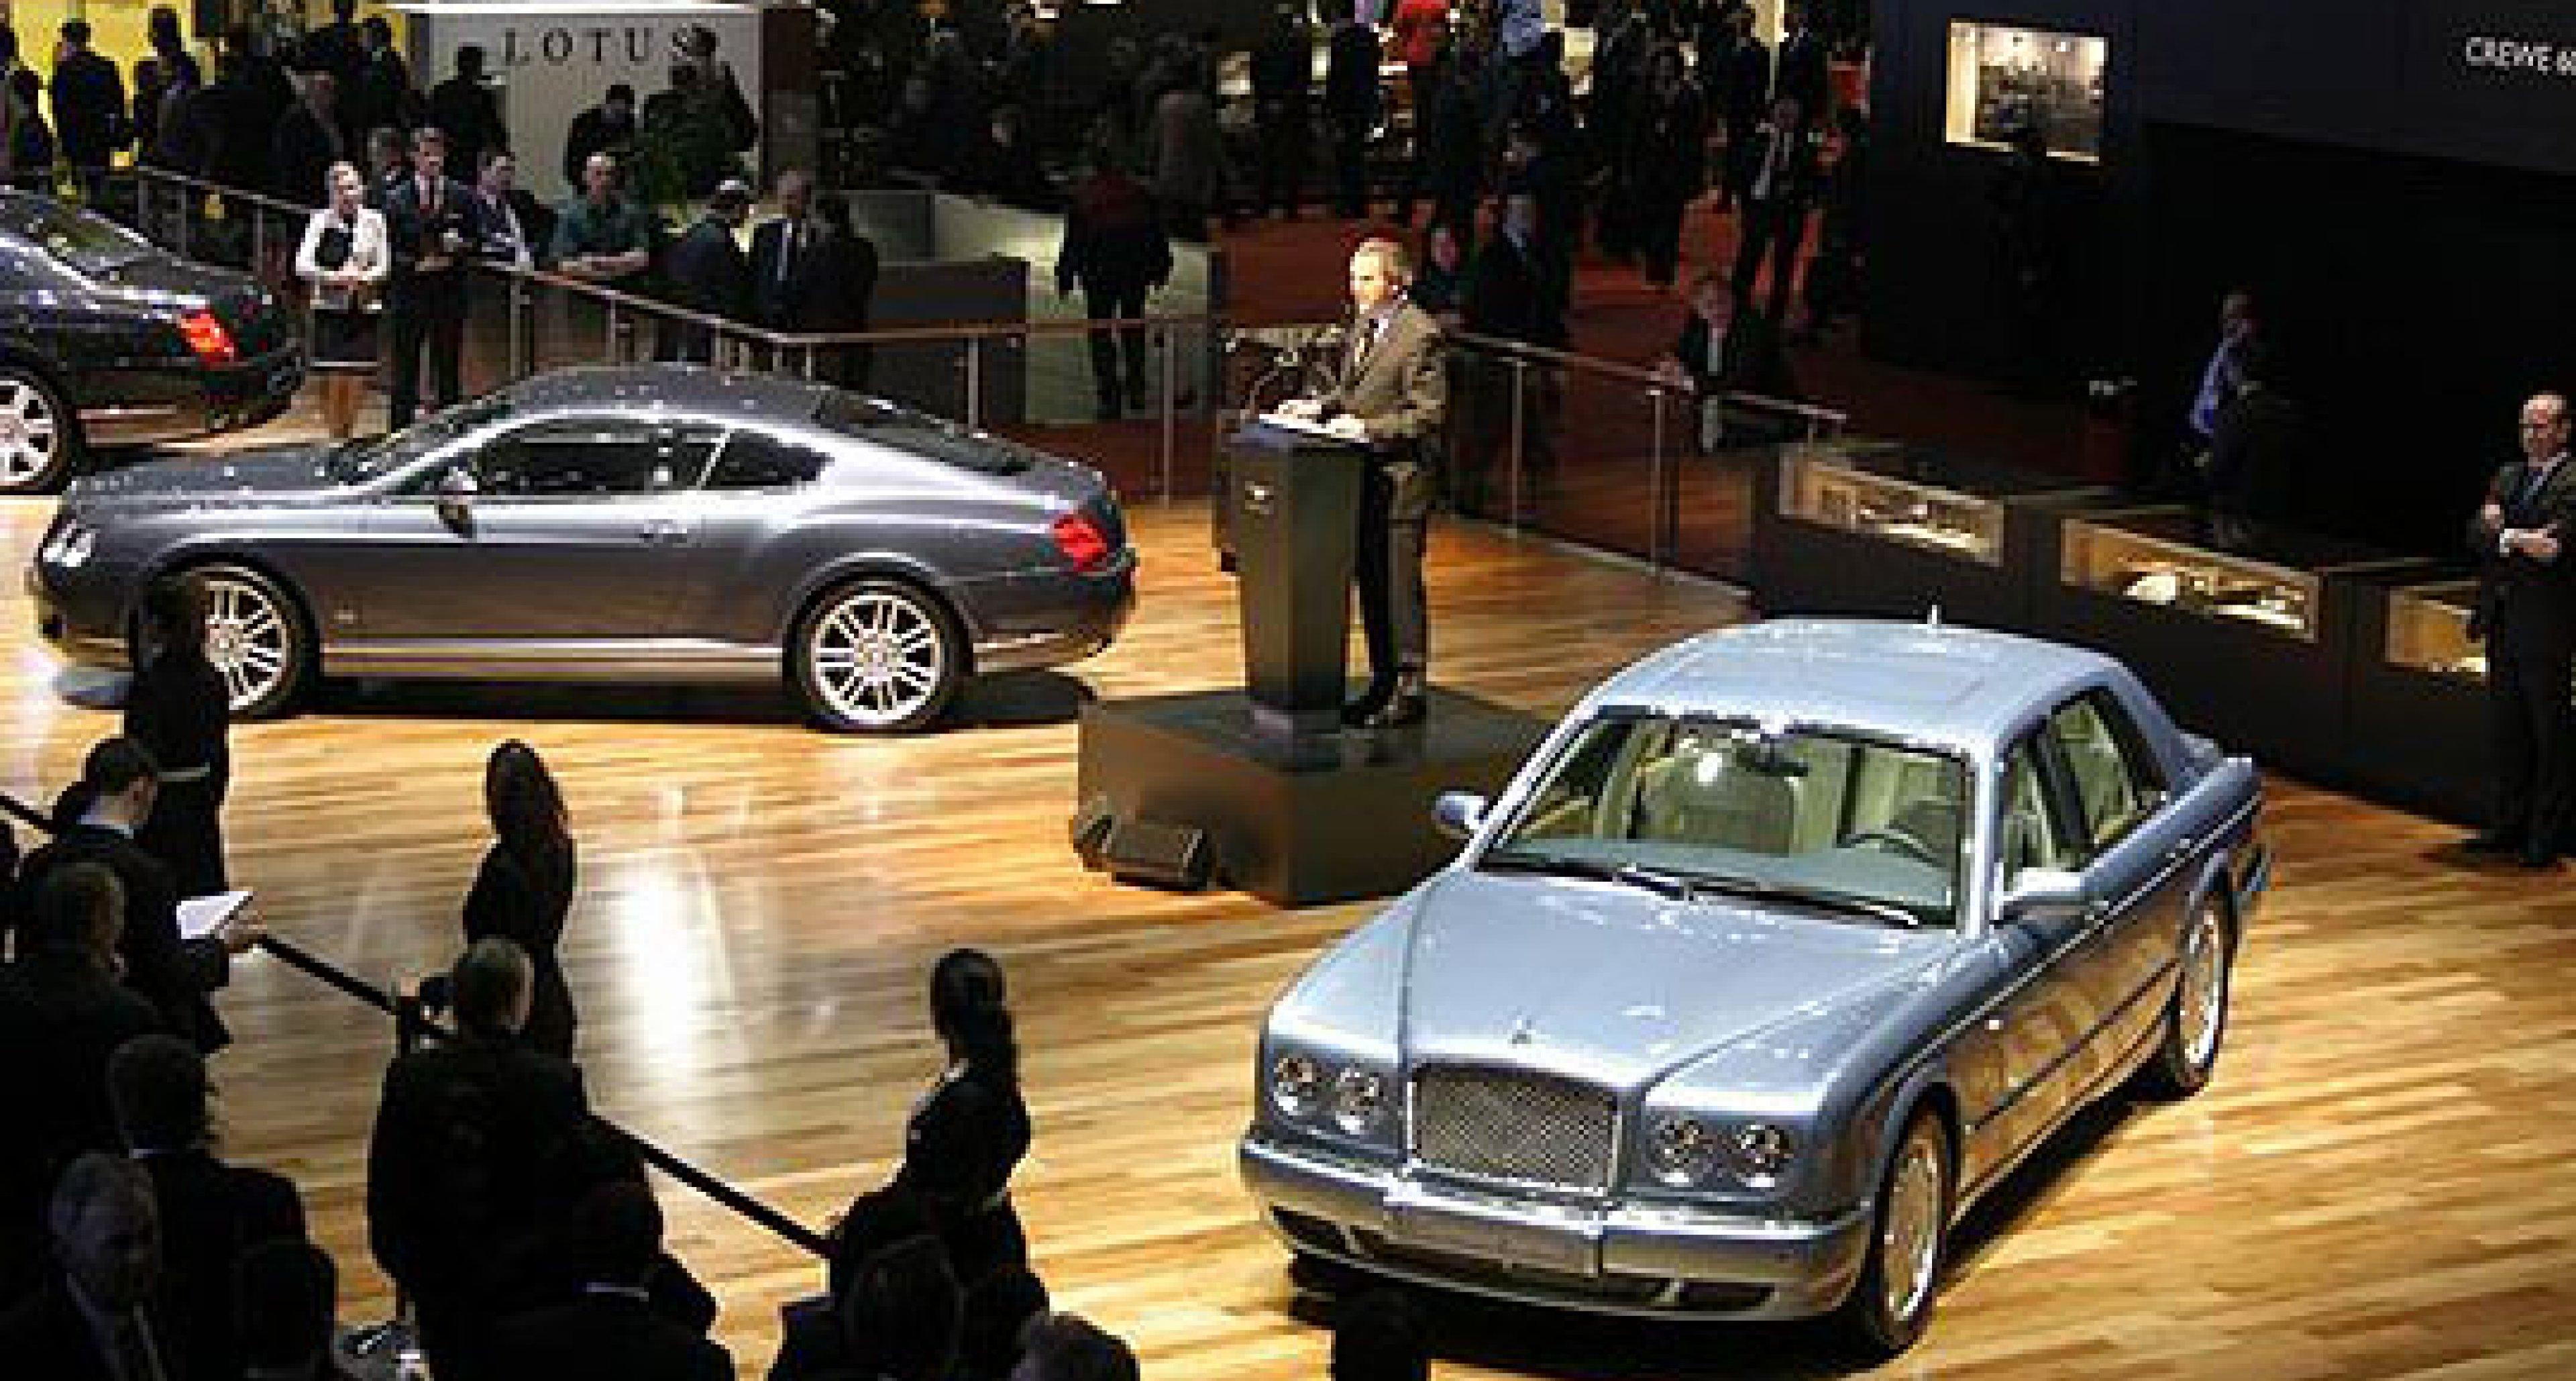 Geneva International Motor Show 2006